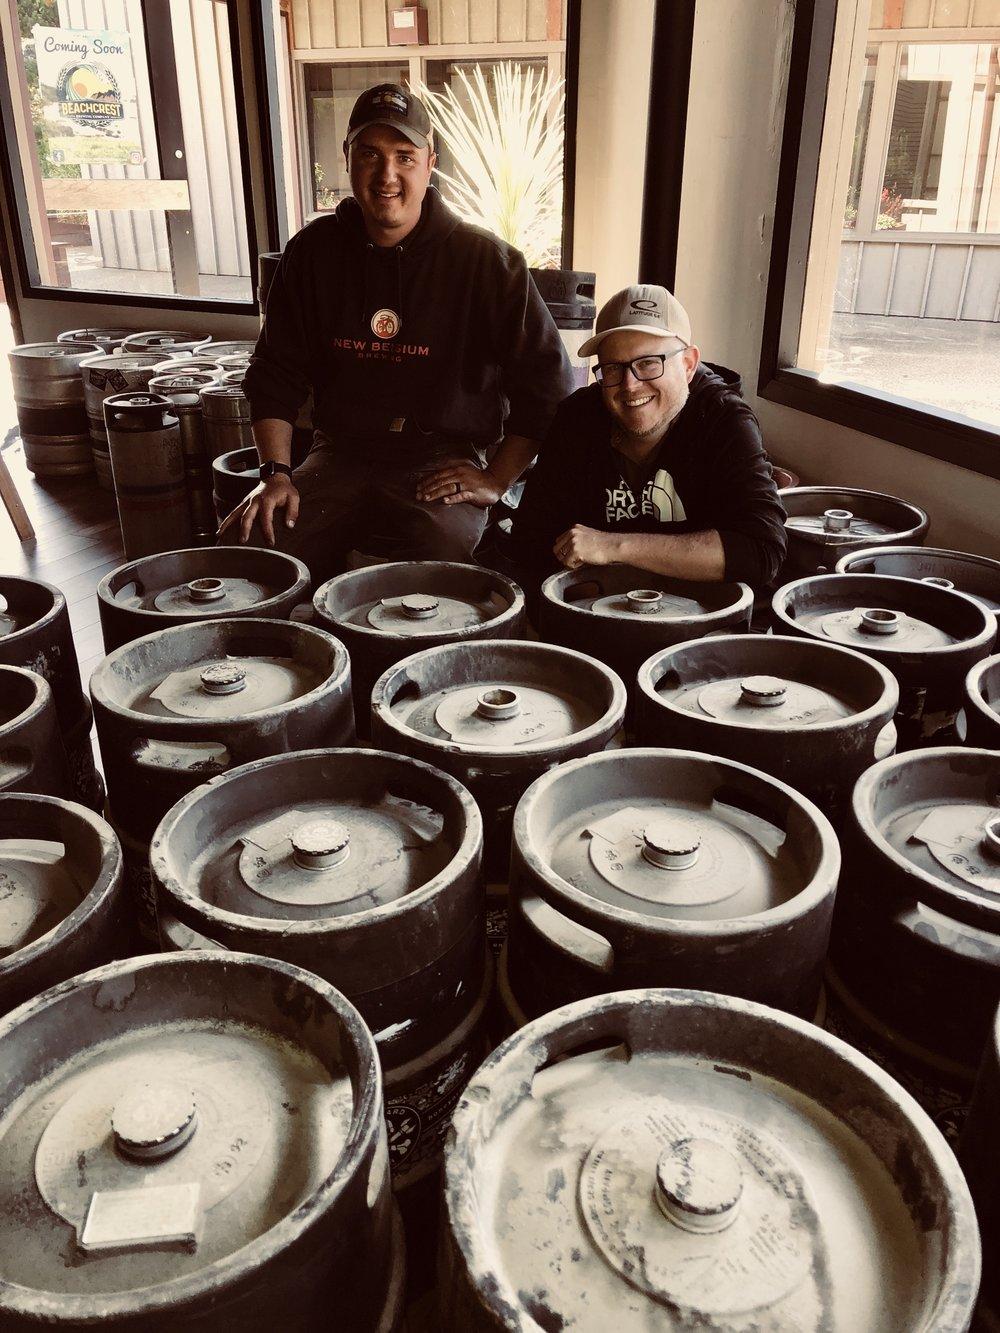 Beachcrest's first round of kegs